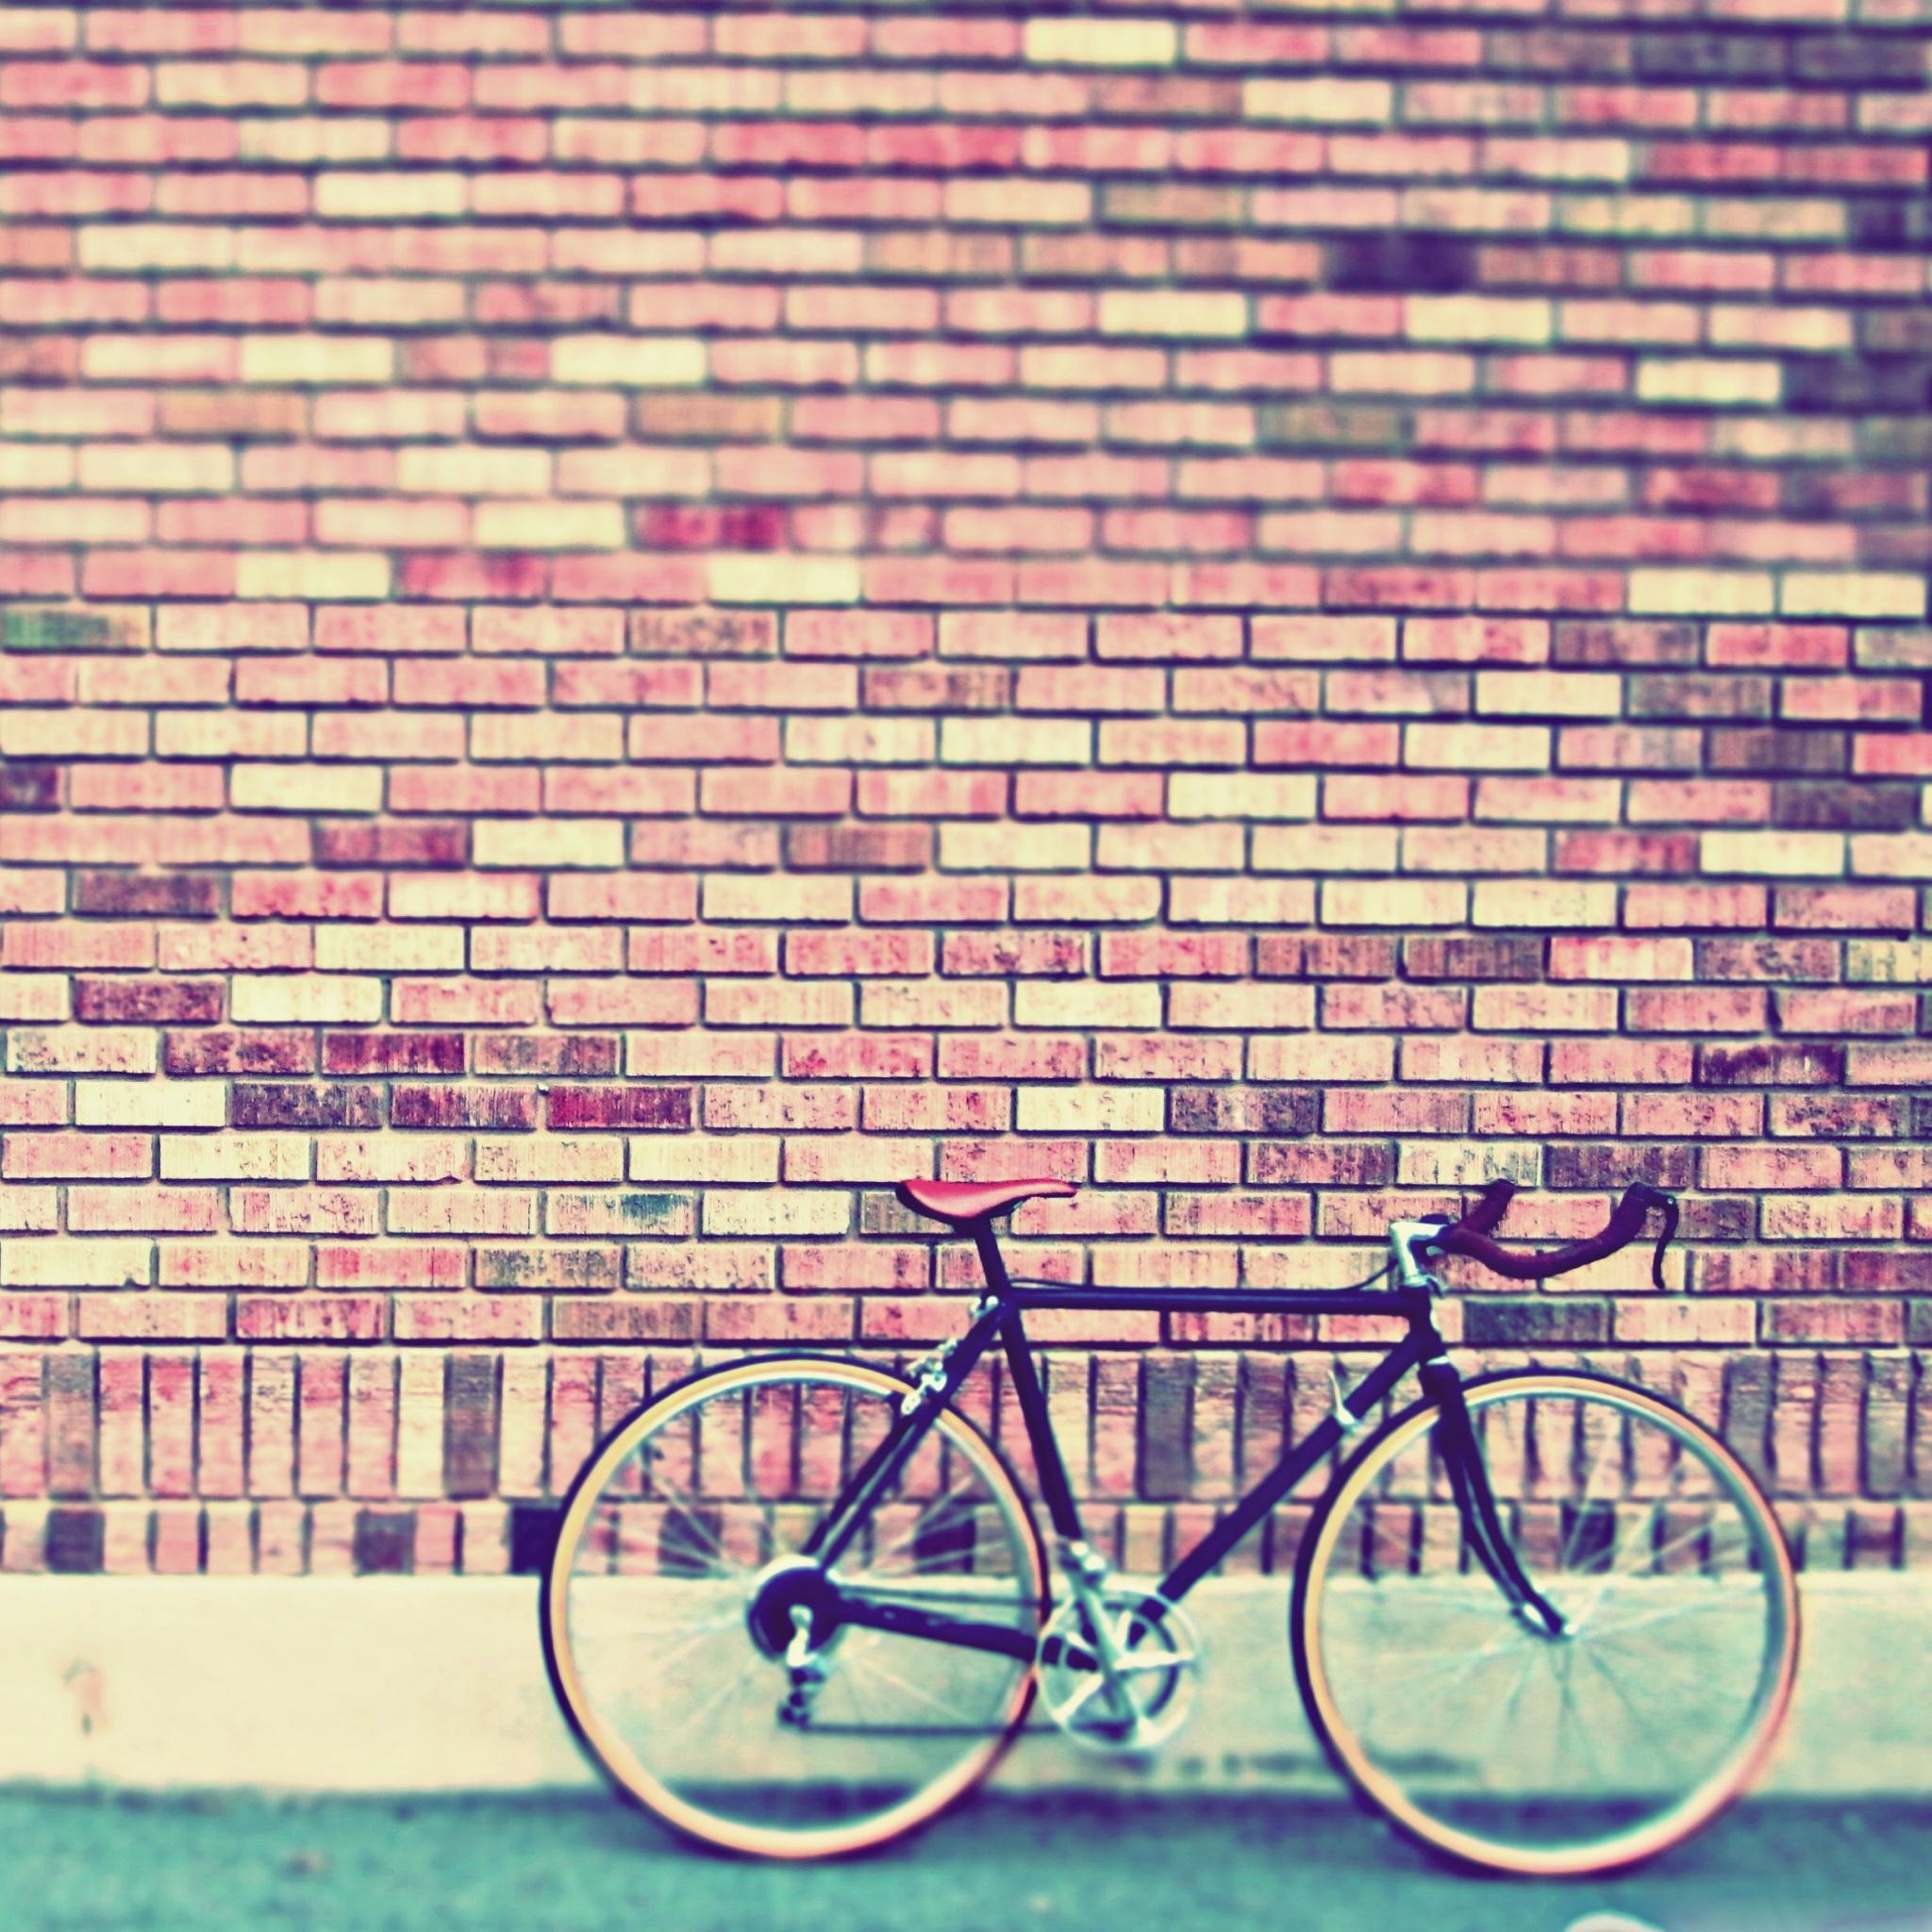 Vintage Bike3Wallpapers iPad Retina Vintage Bike   iPad Retina